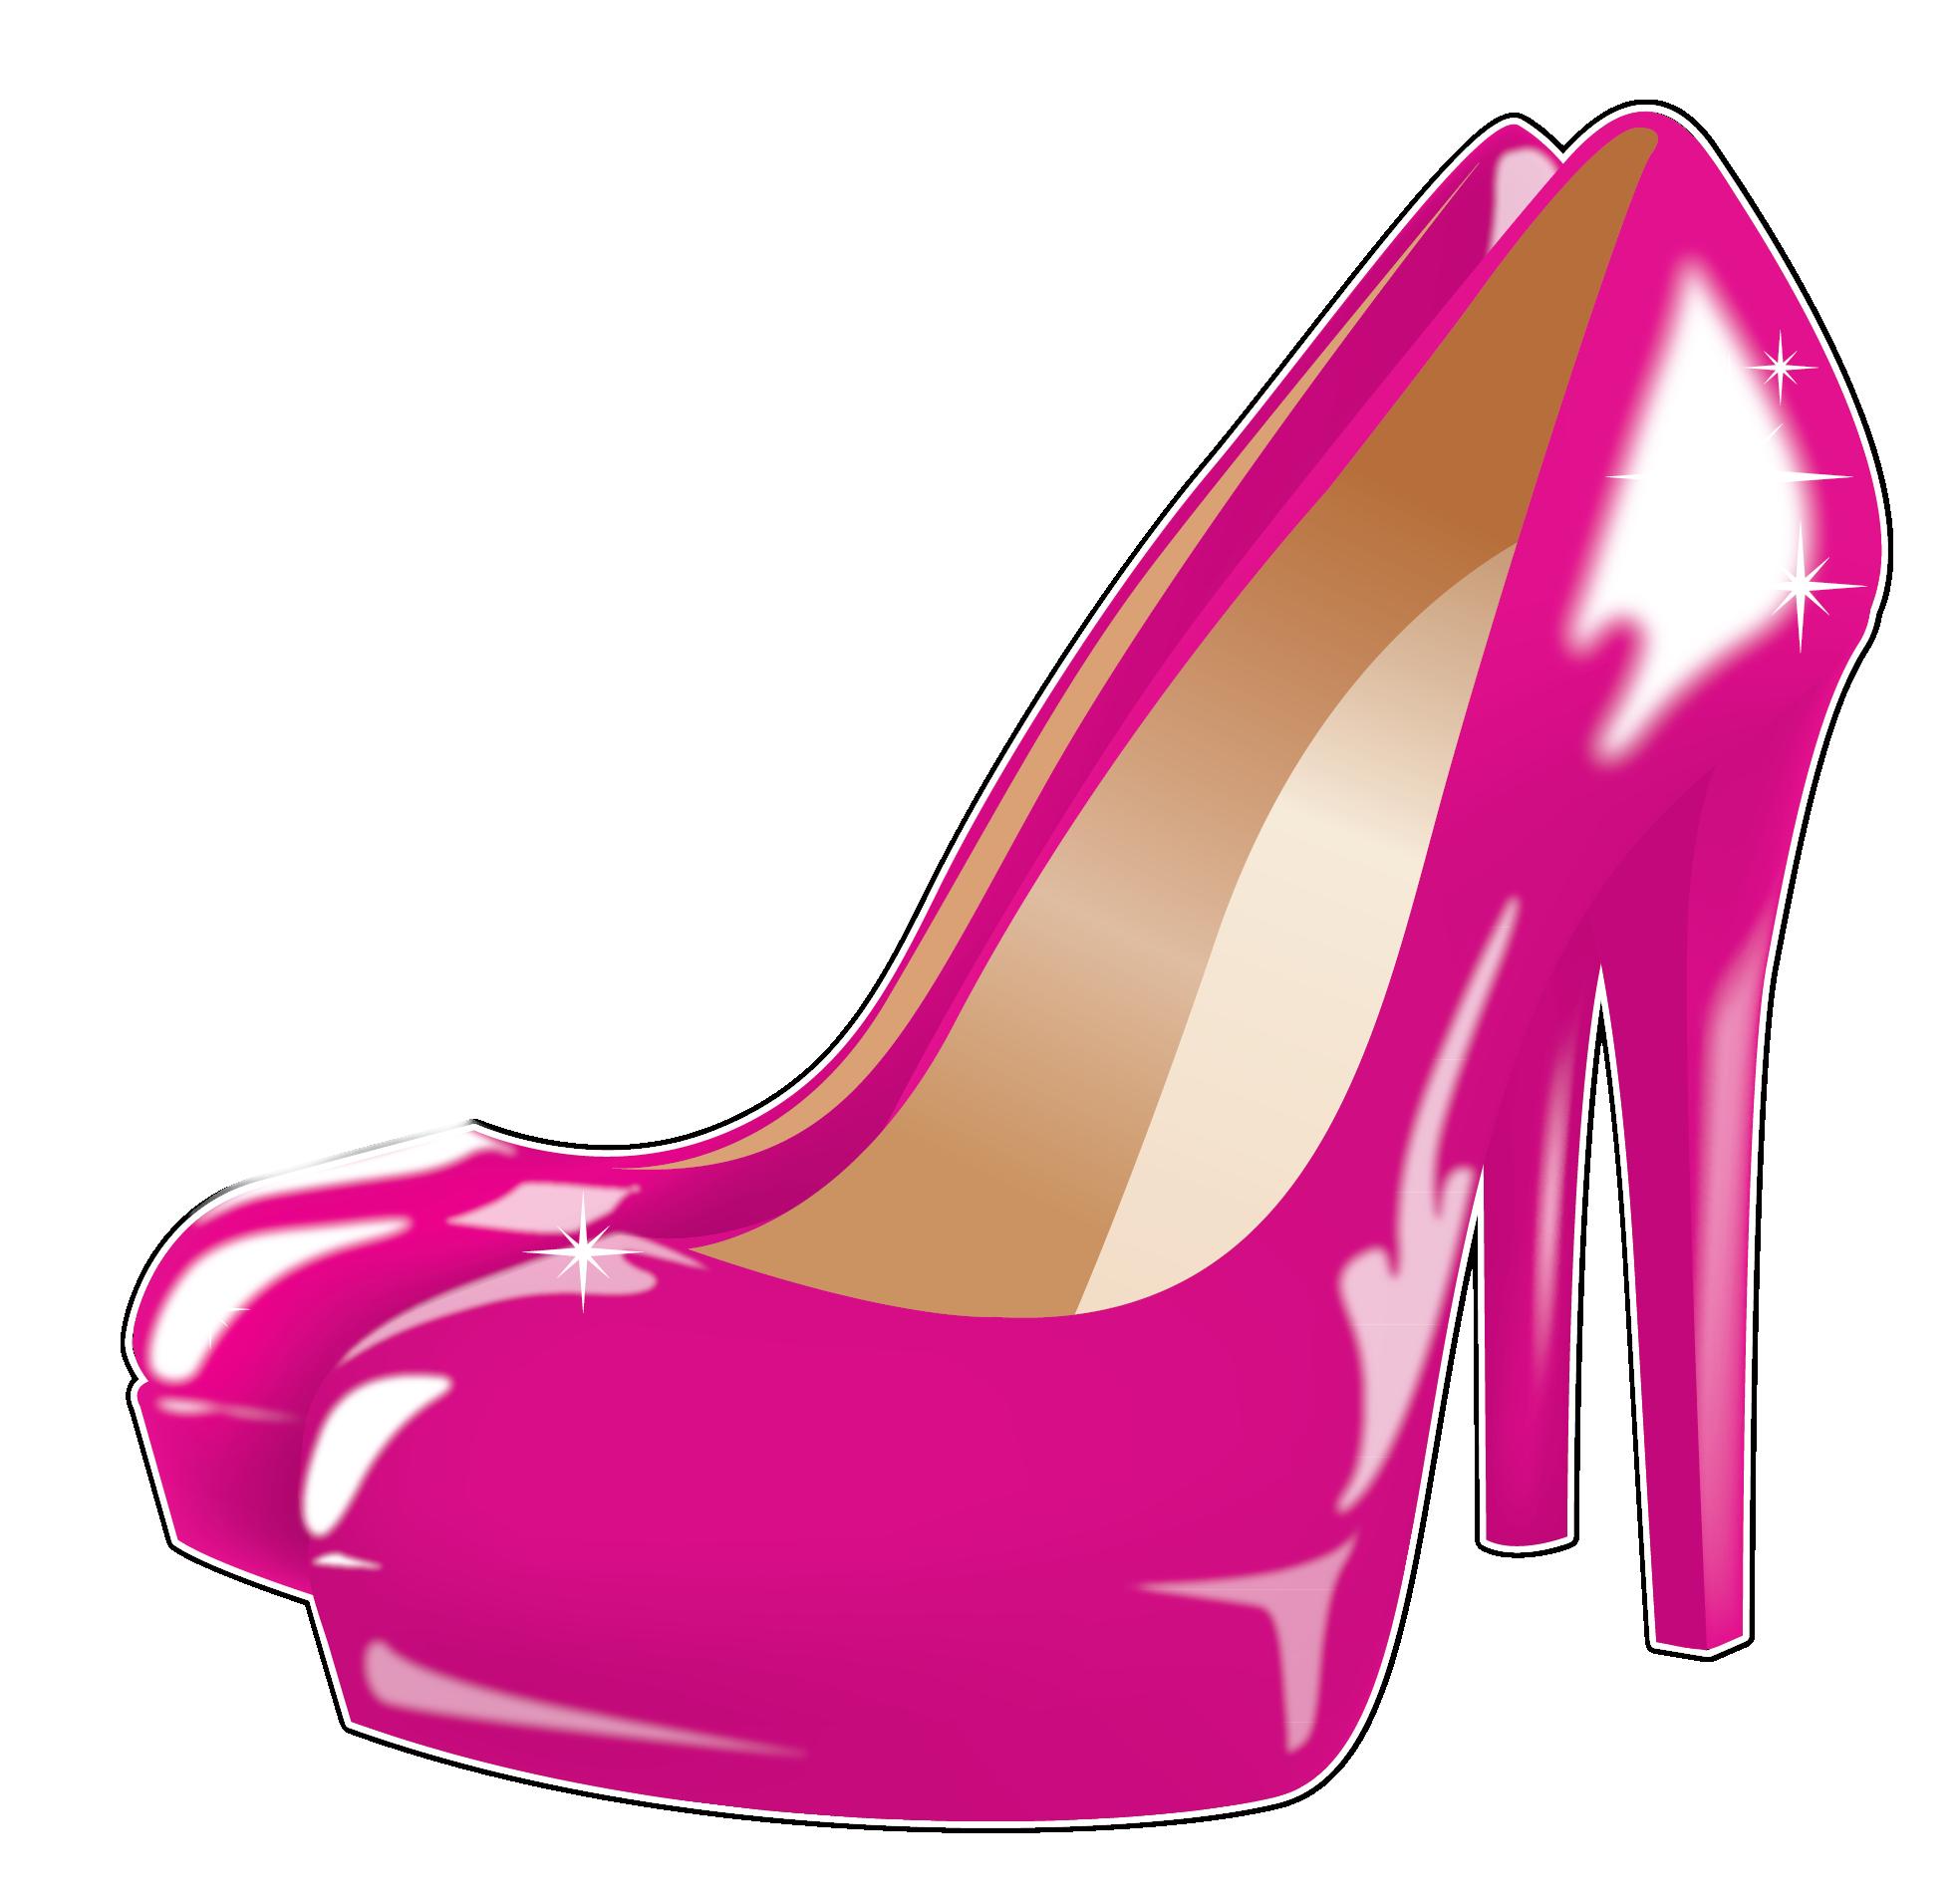 Hd Heels Pink Png Transparent Background